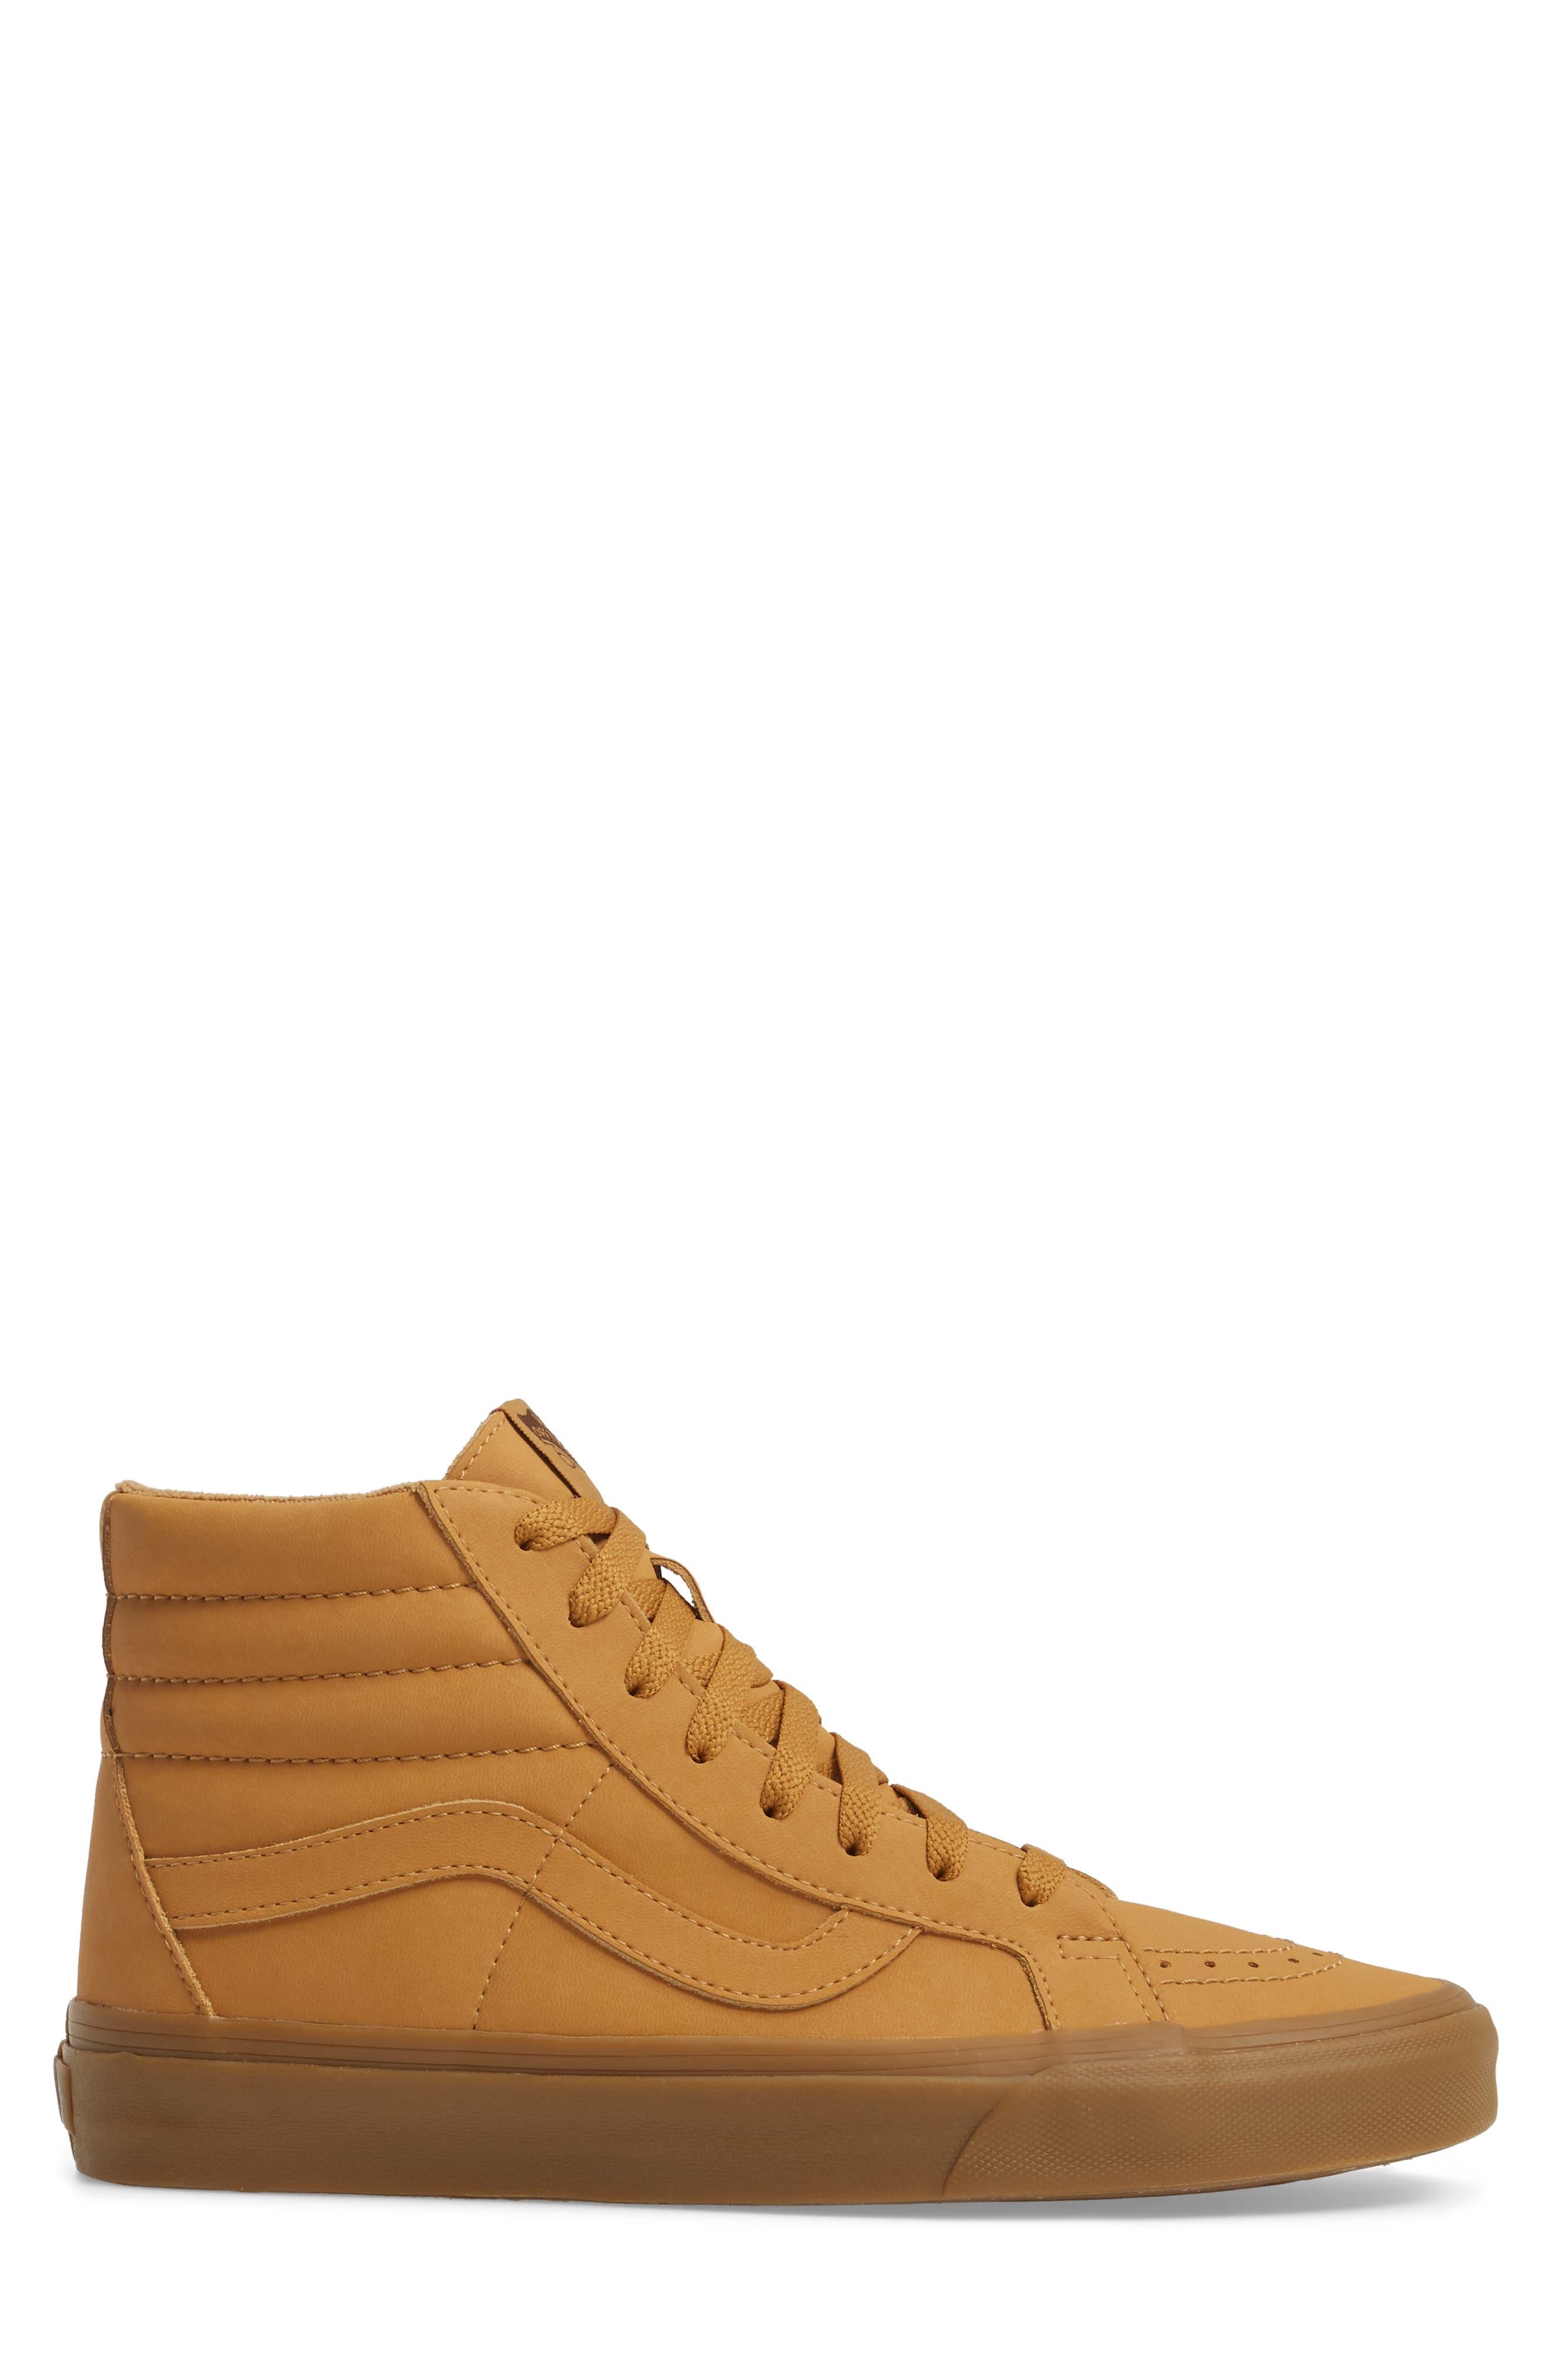 'Sk8-Hi Reissue' Sneaker,                             Alternate thumbnail 3, color,                             Light Gum/ Mono Canvas/Leather